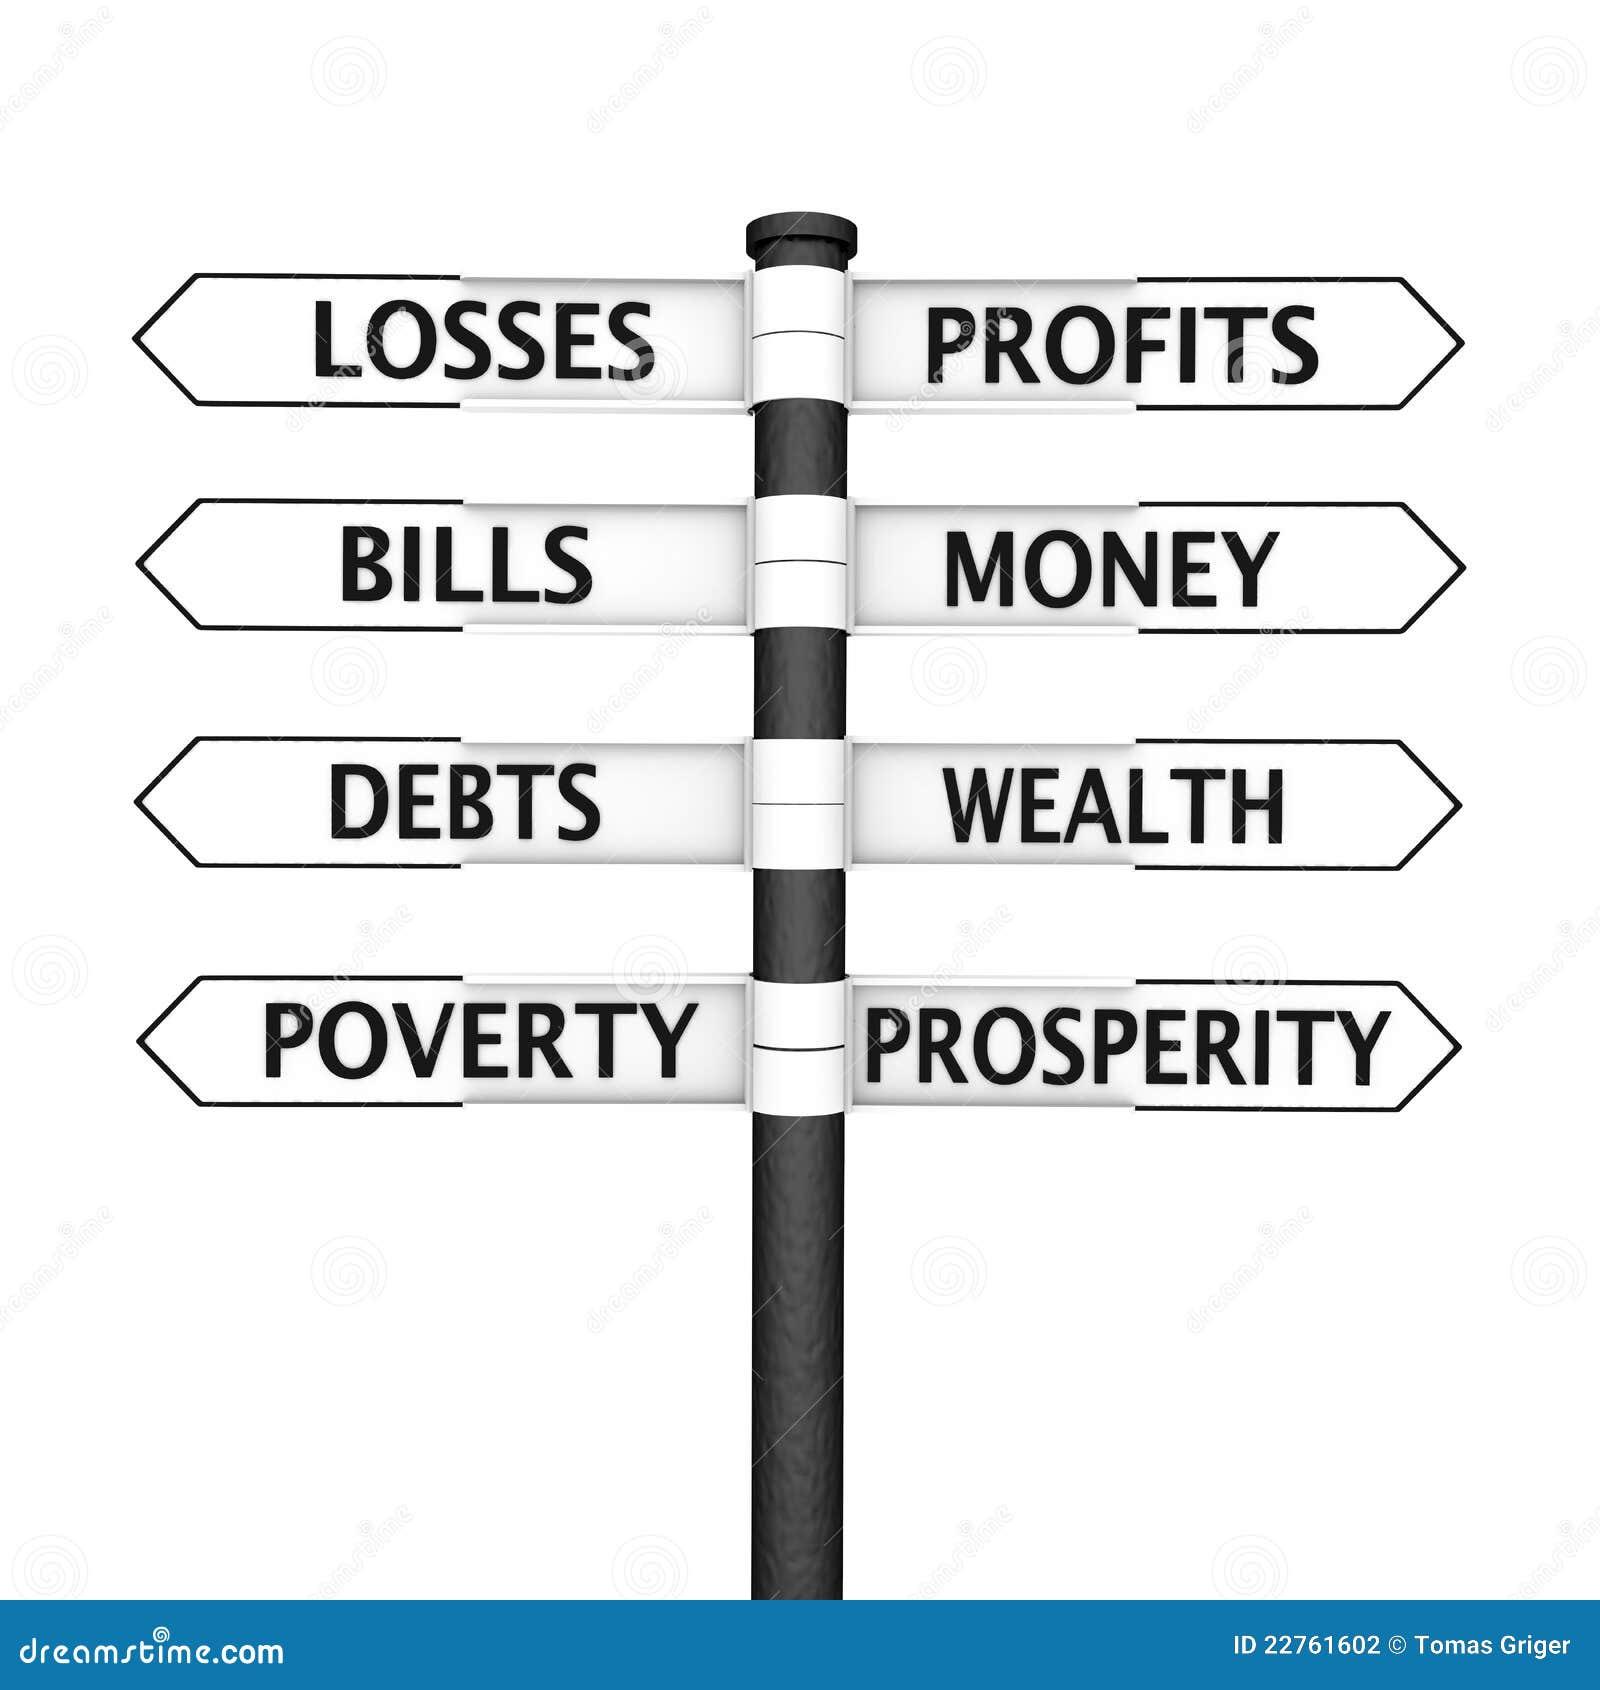 Wealth vs. Poverty